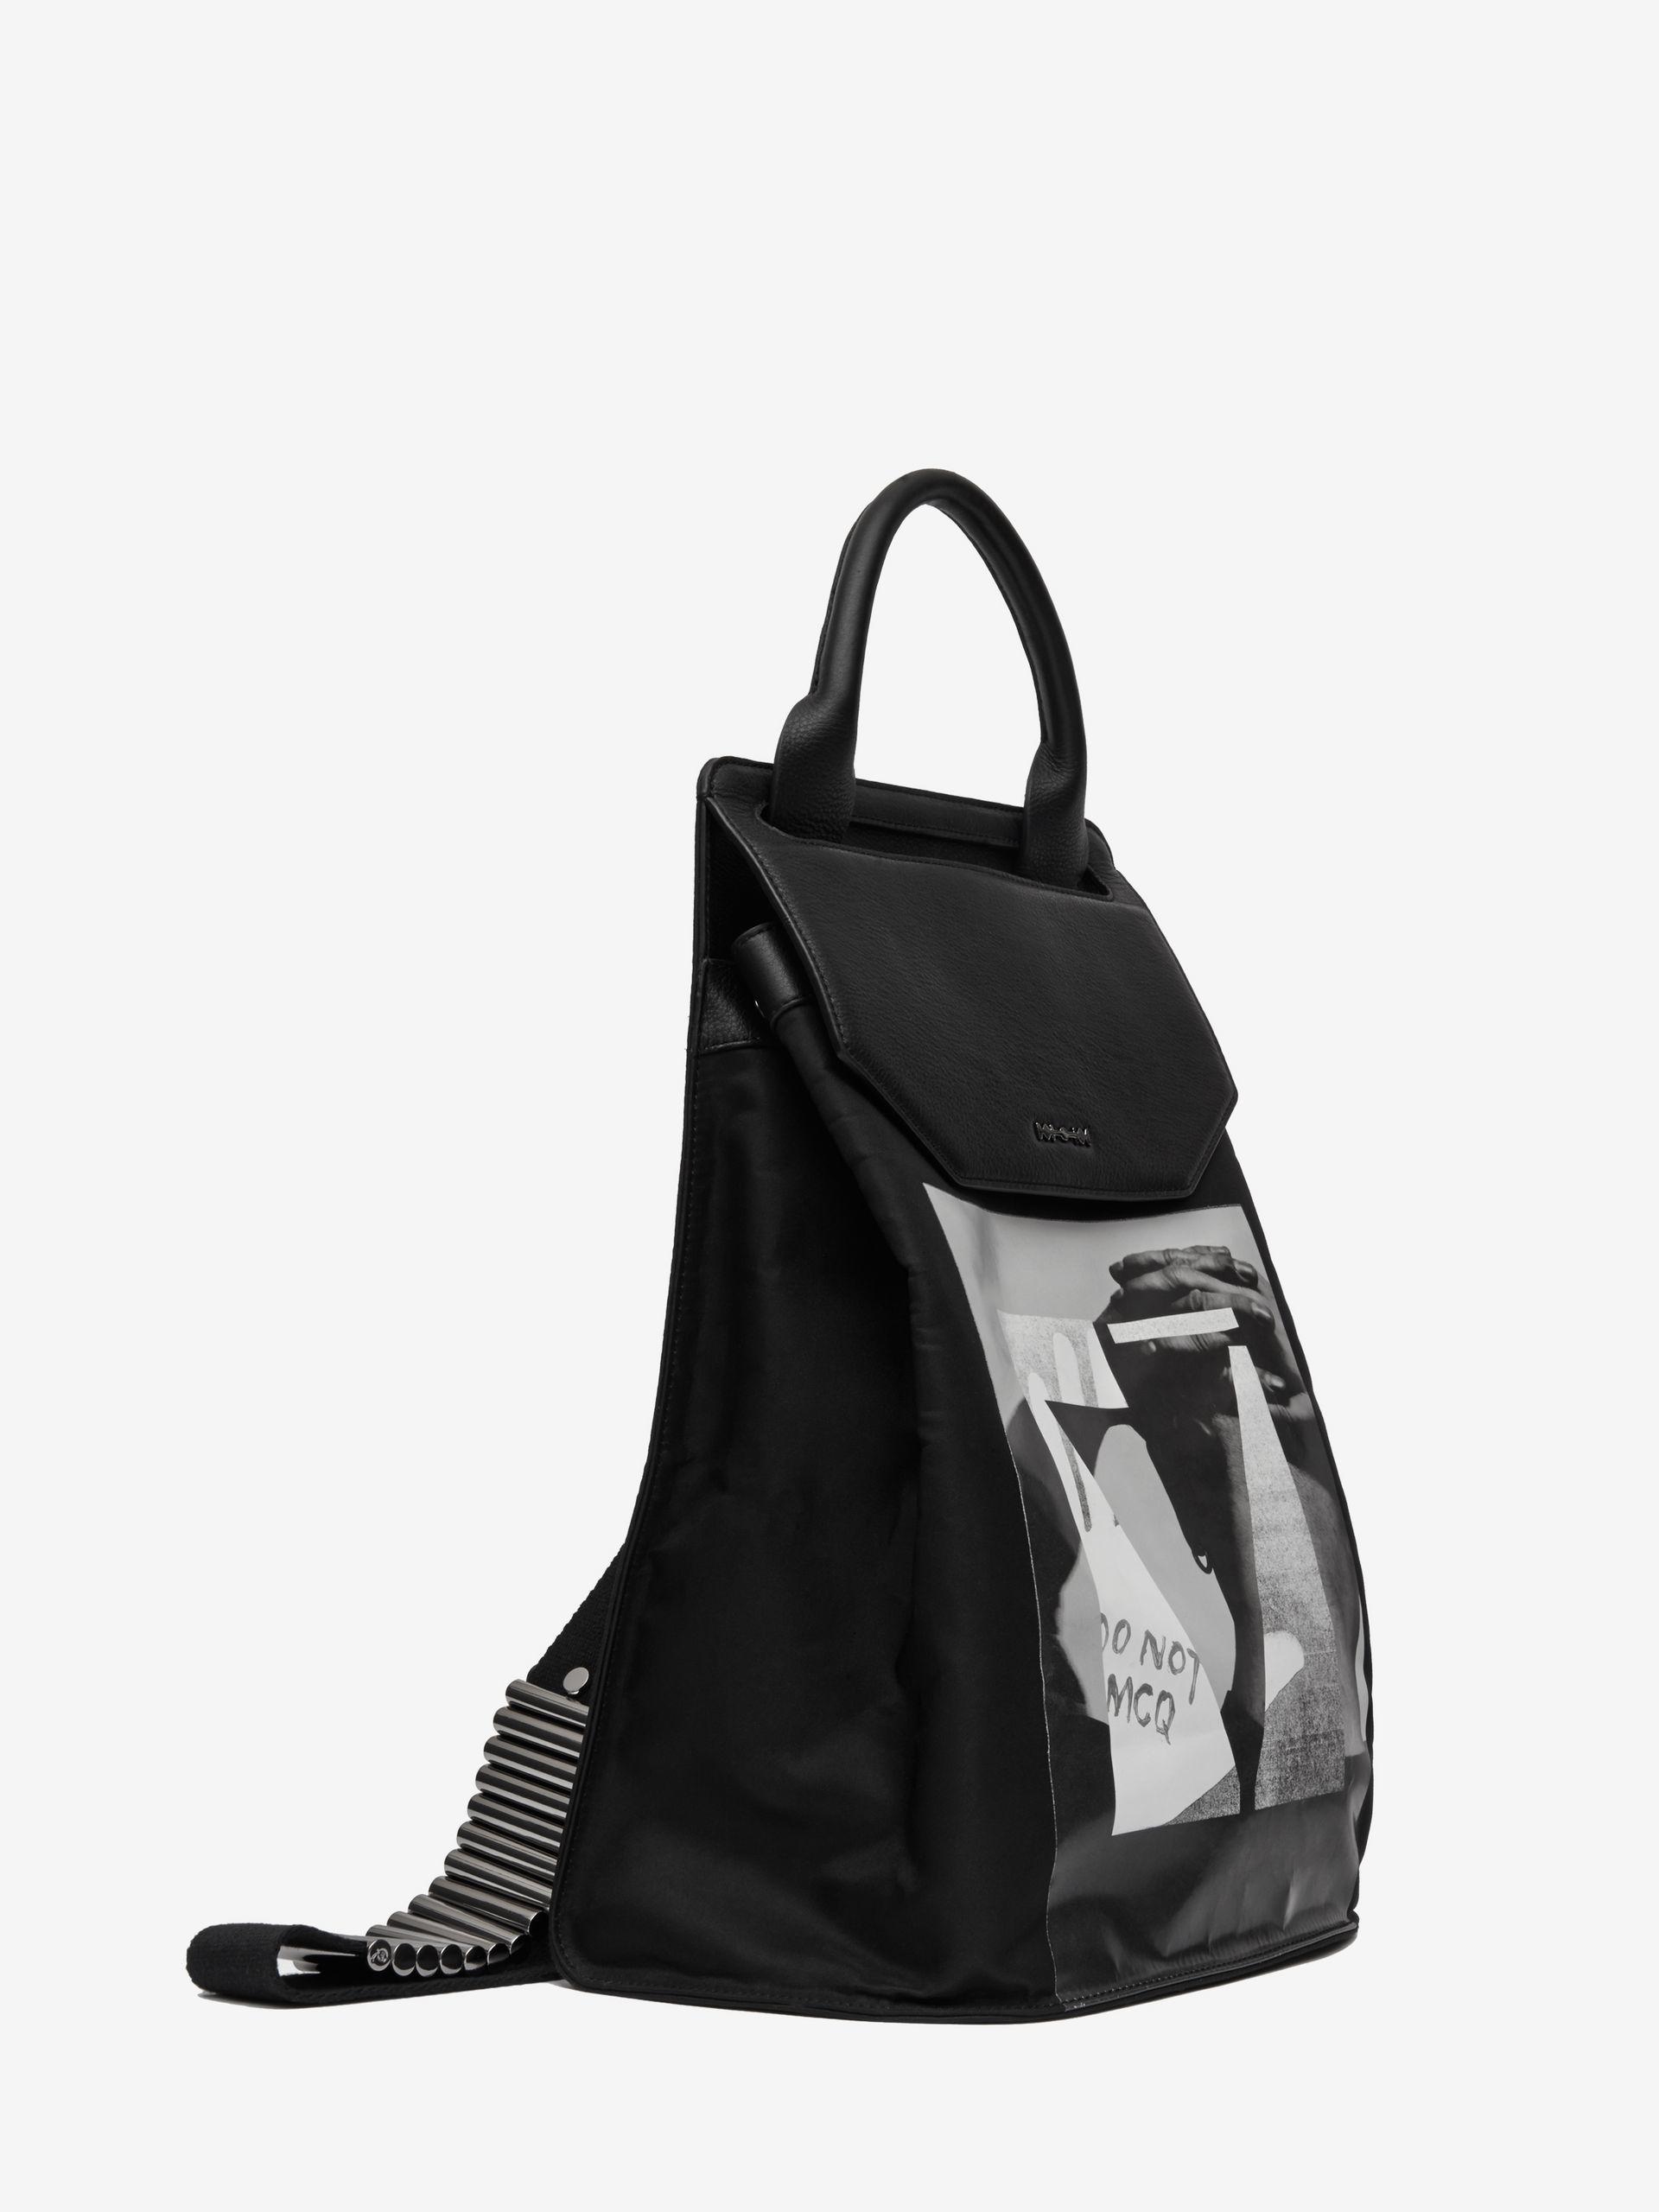 Black Padded Backpack Zara Ceagesp Eastpak Pakamp039r Quilt Sunday